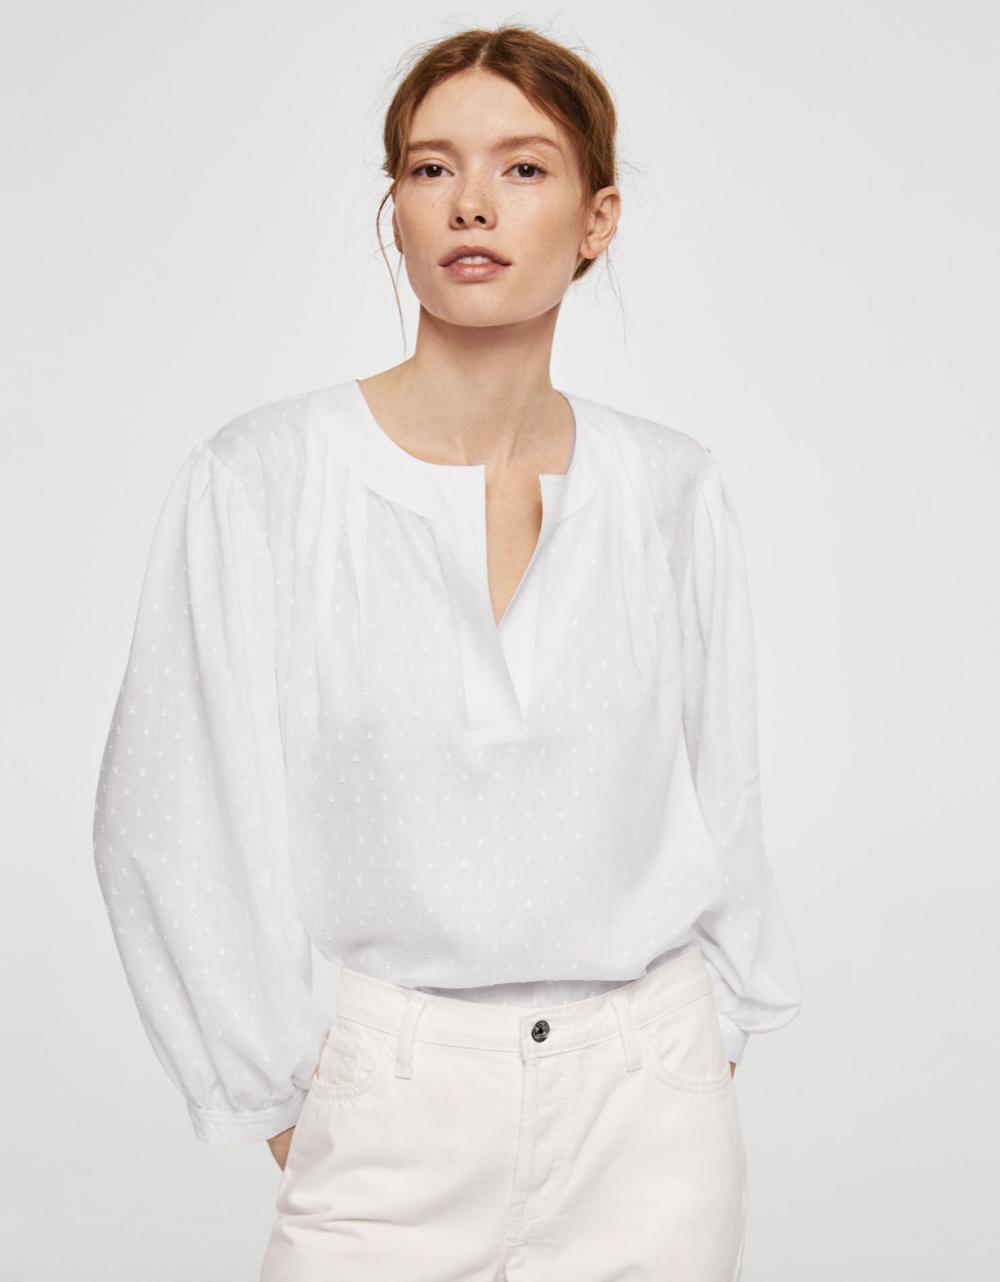 plumeti blouse –$59.99